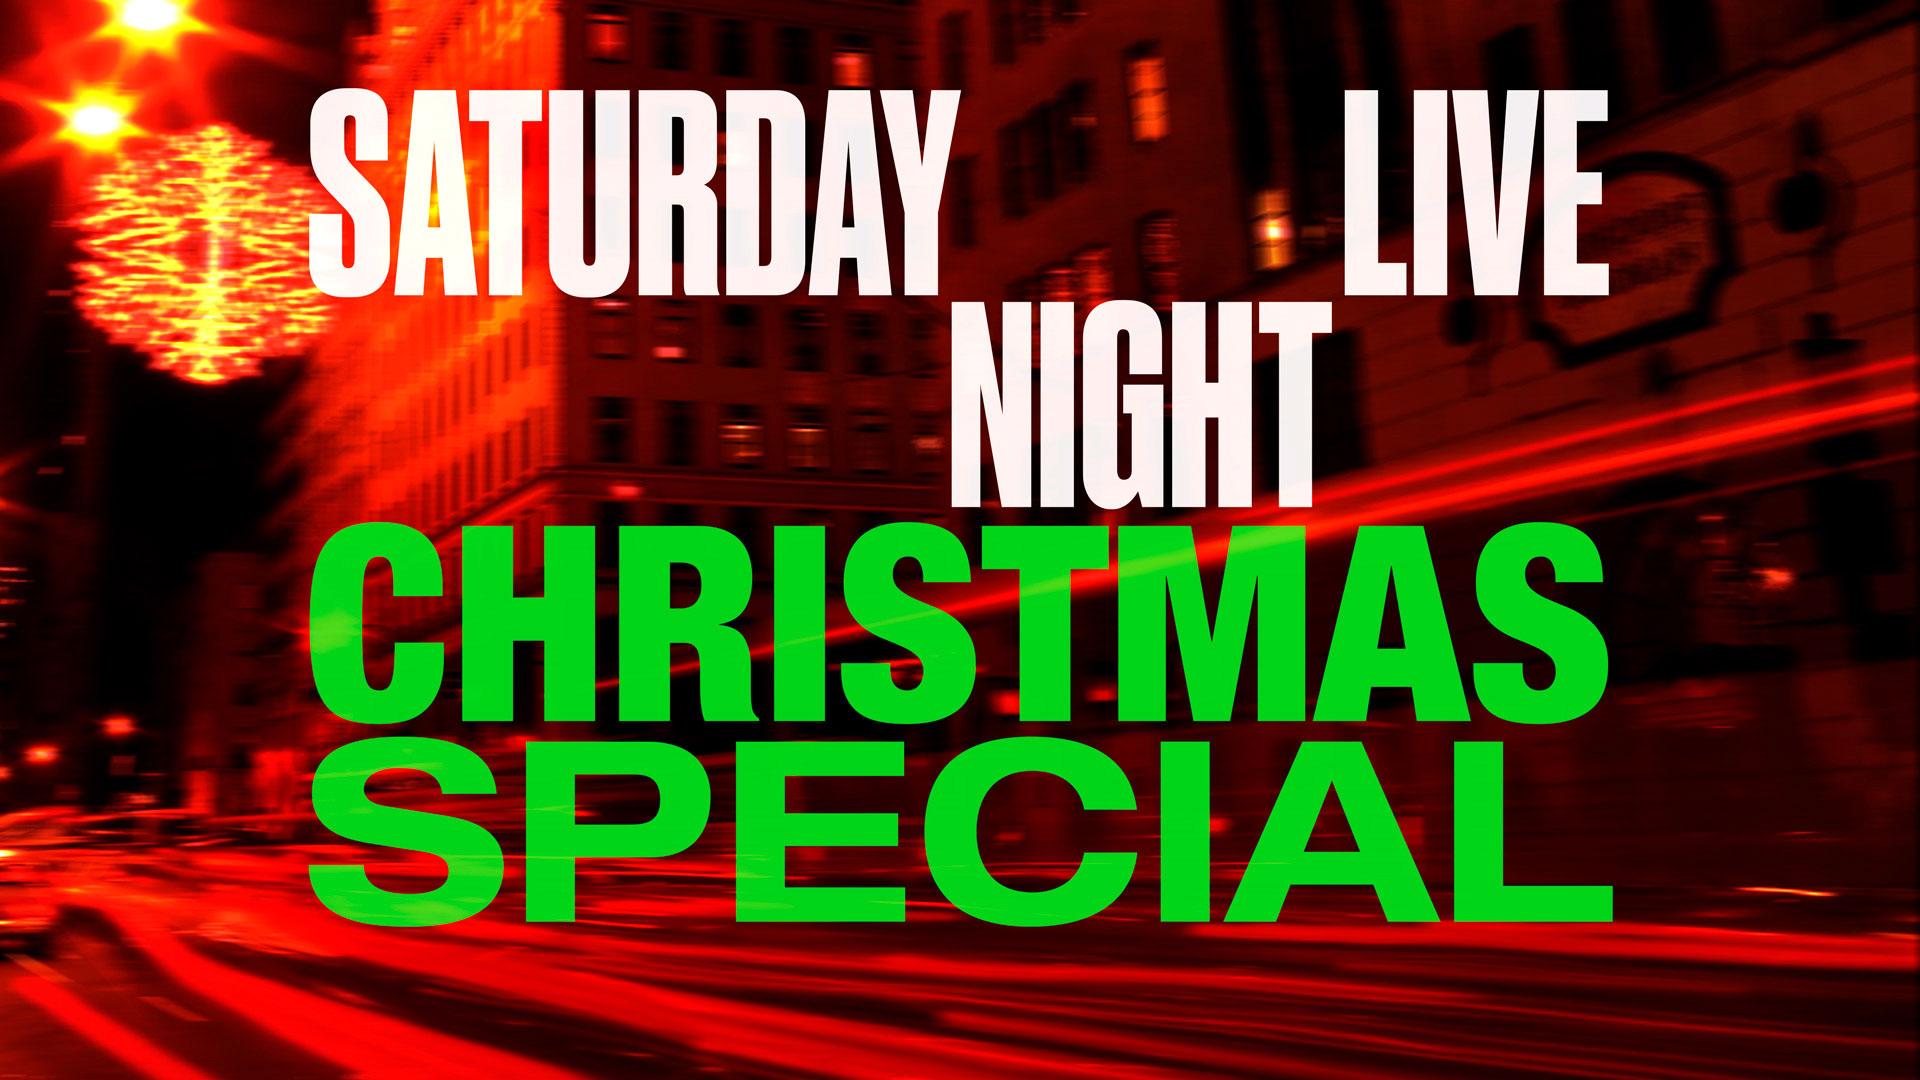 Snl 2020 Christmas Special Watch Saturday Night Live Episode: A Saturday Night Live Christmas